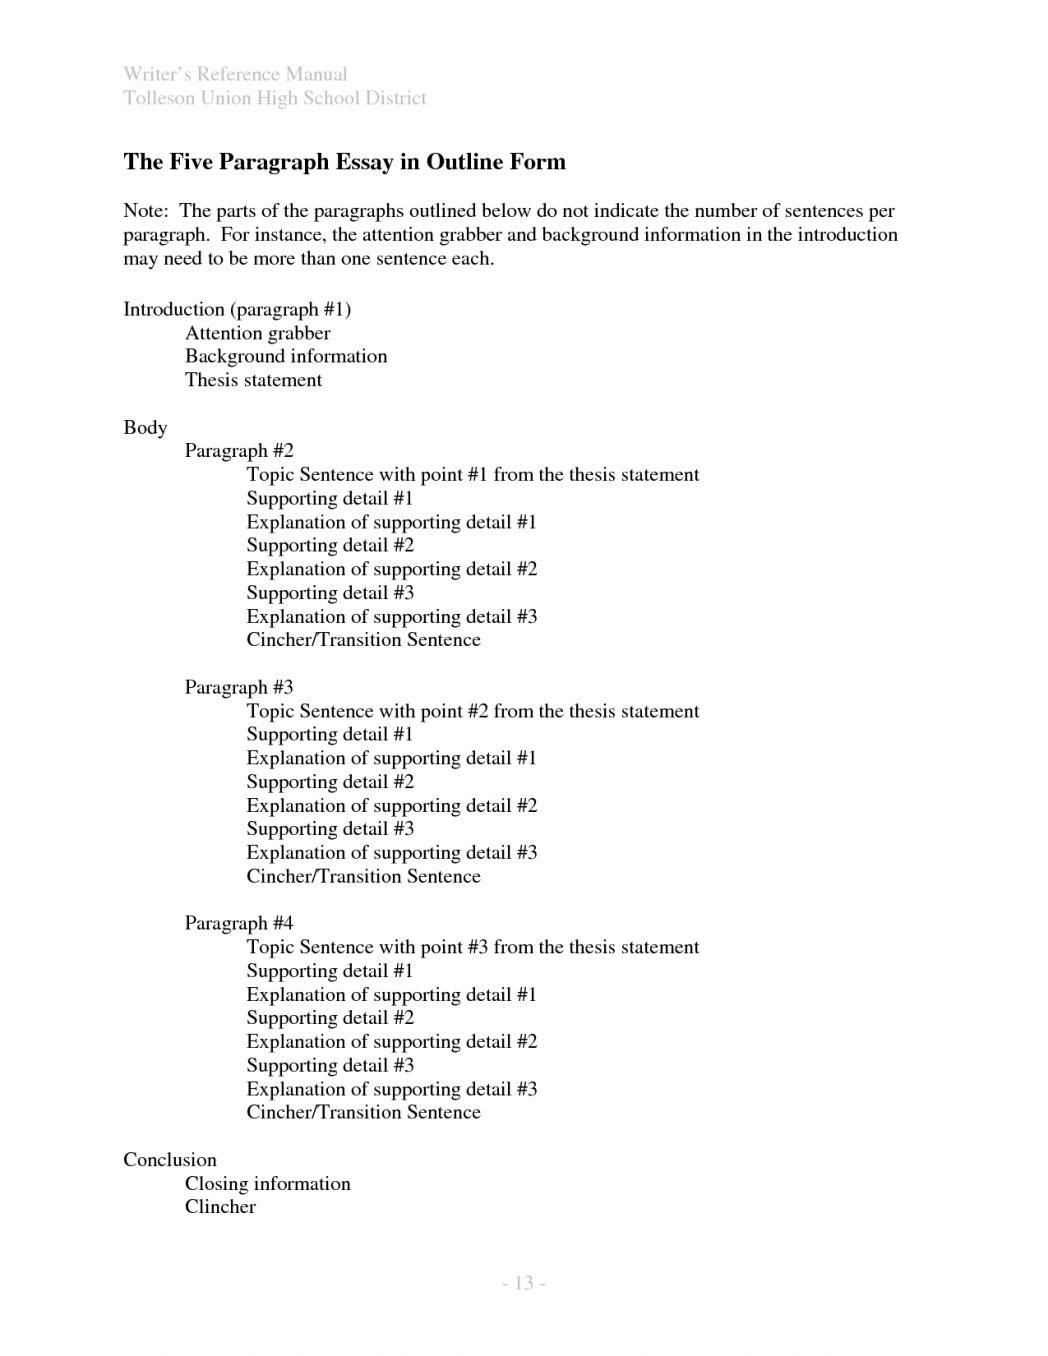 how to write paragraph essay persuasive template high school   how to write paragraph essay persuasive template high school writings  and essays format onwe bioinnovate co pertainin body outline opinion  argumentative